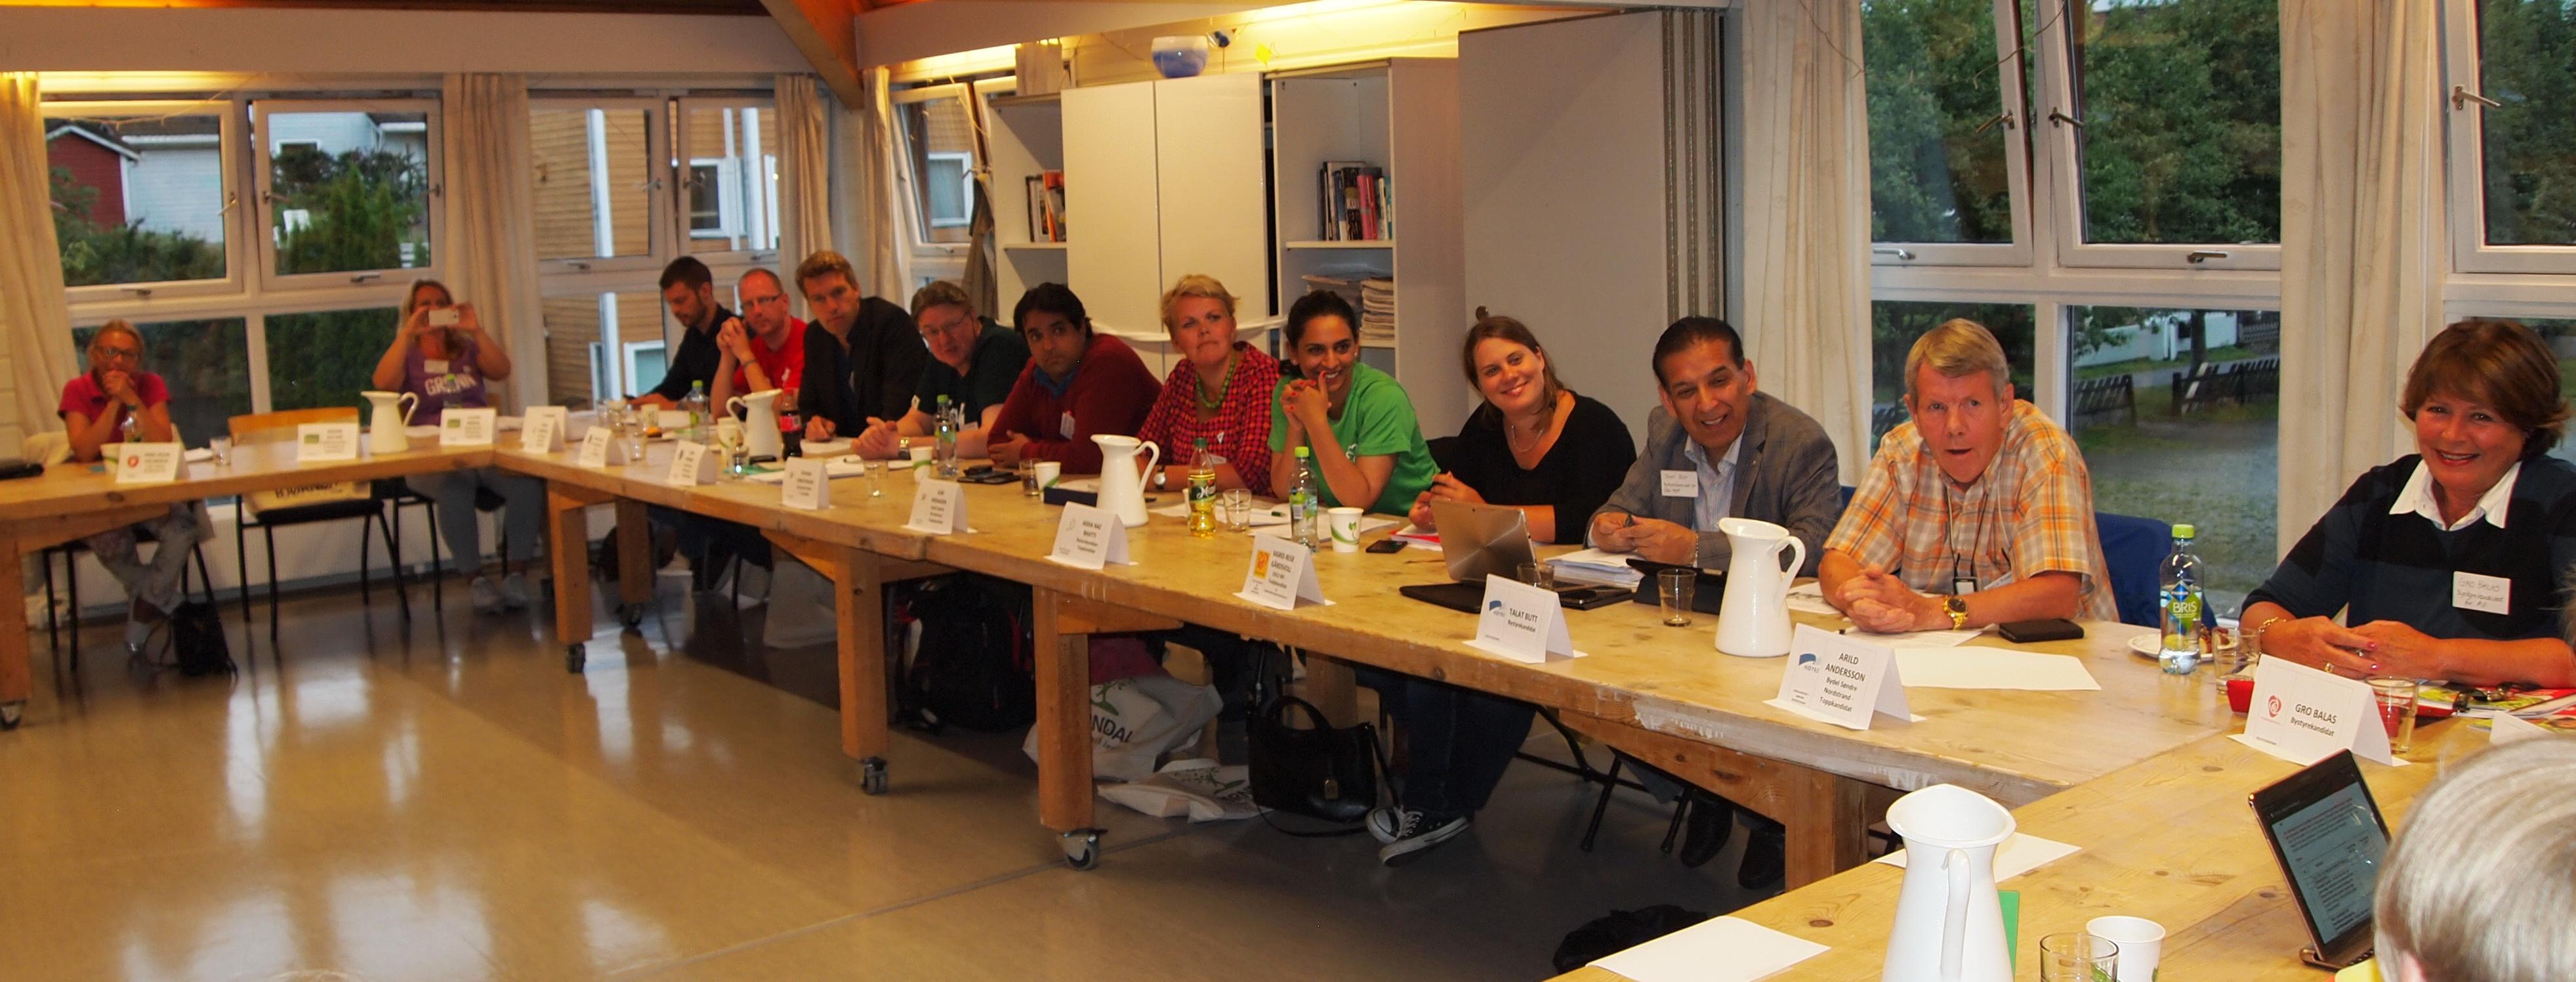 På dialogmøtet 26.08.2015 stilte hele 16 politikere! (foto: Sven Brun)